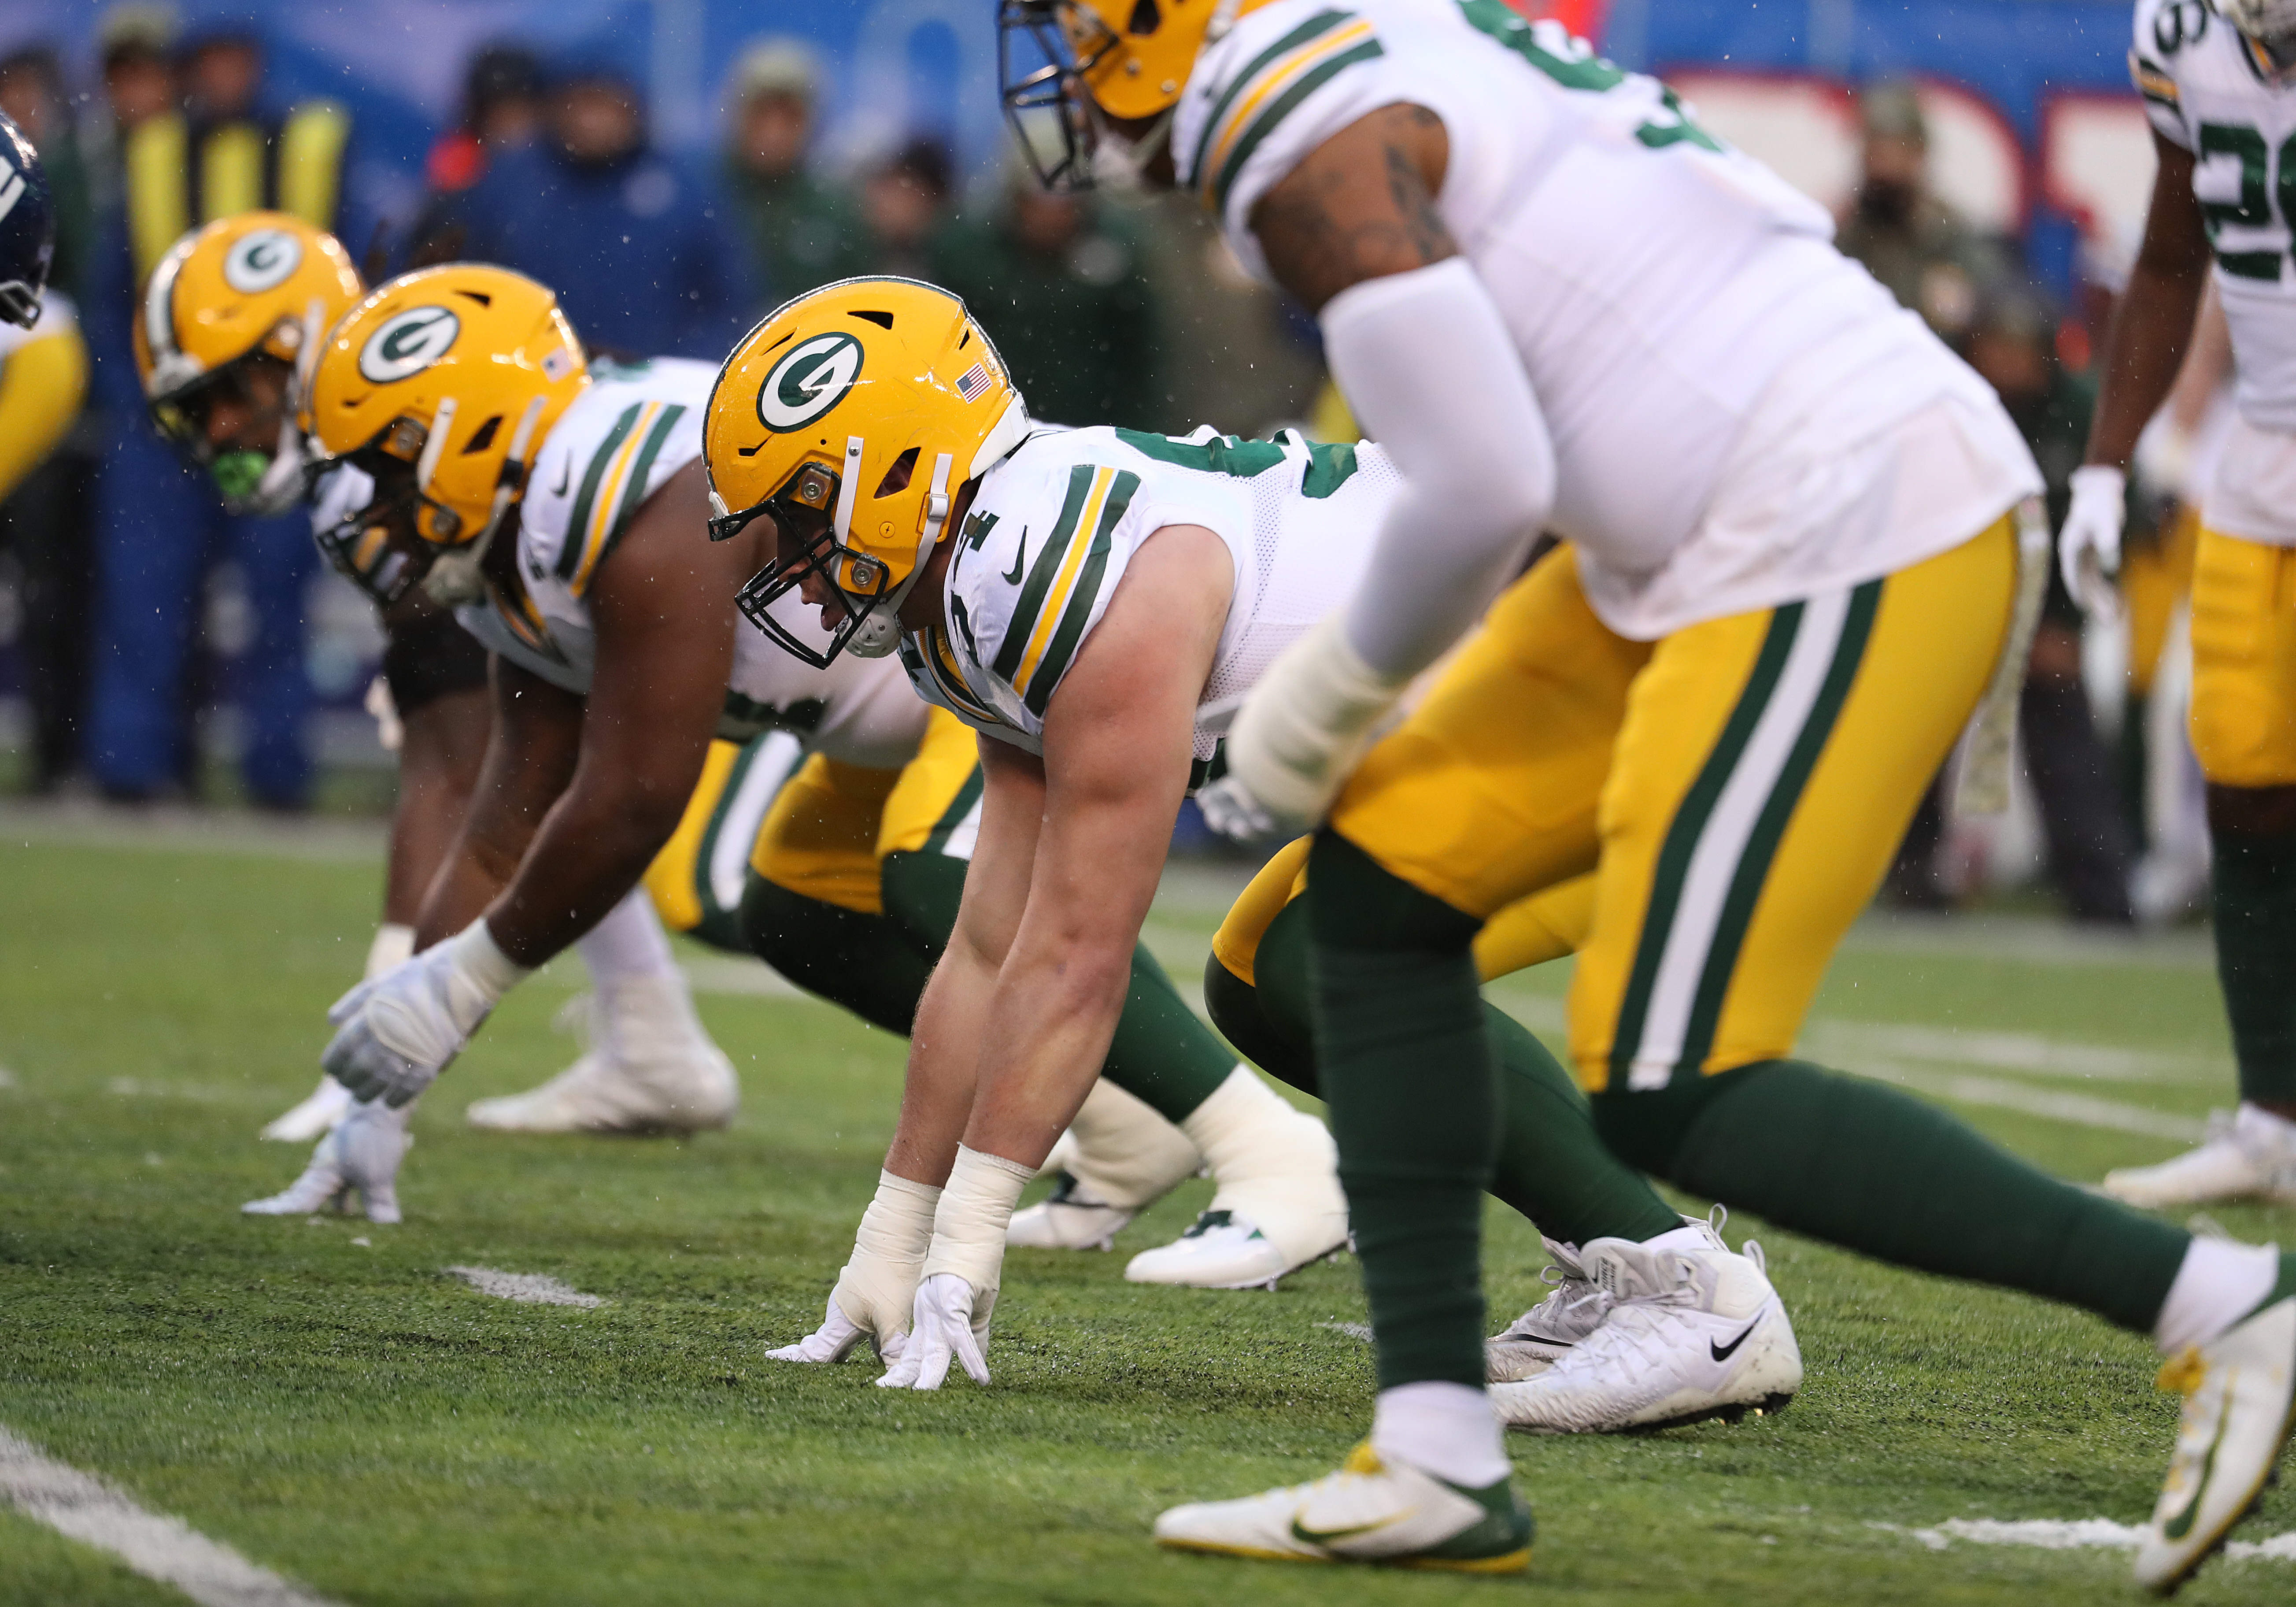 Green Bay Packers vNew York Giants